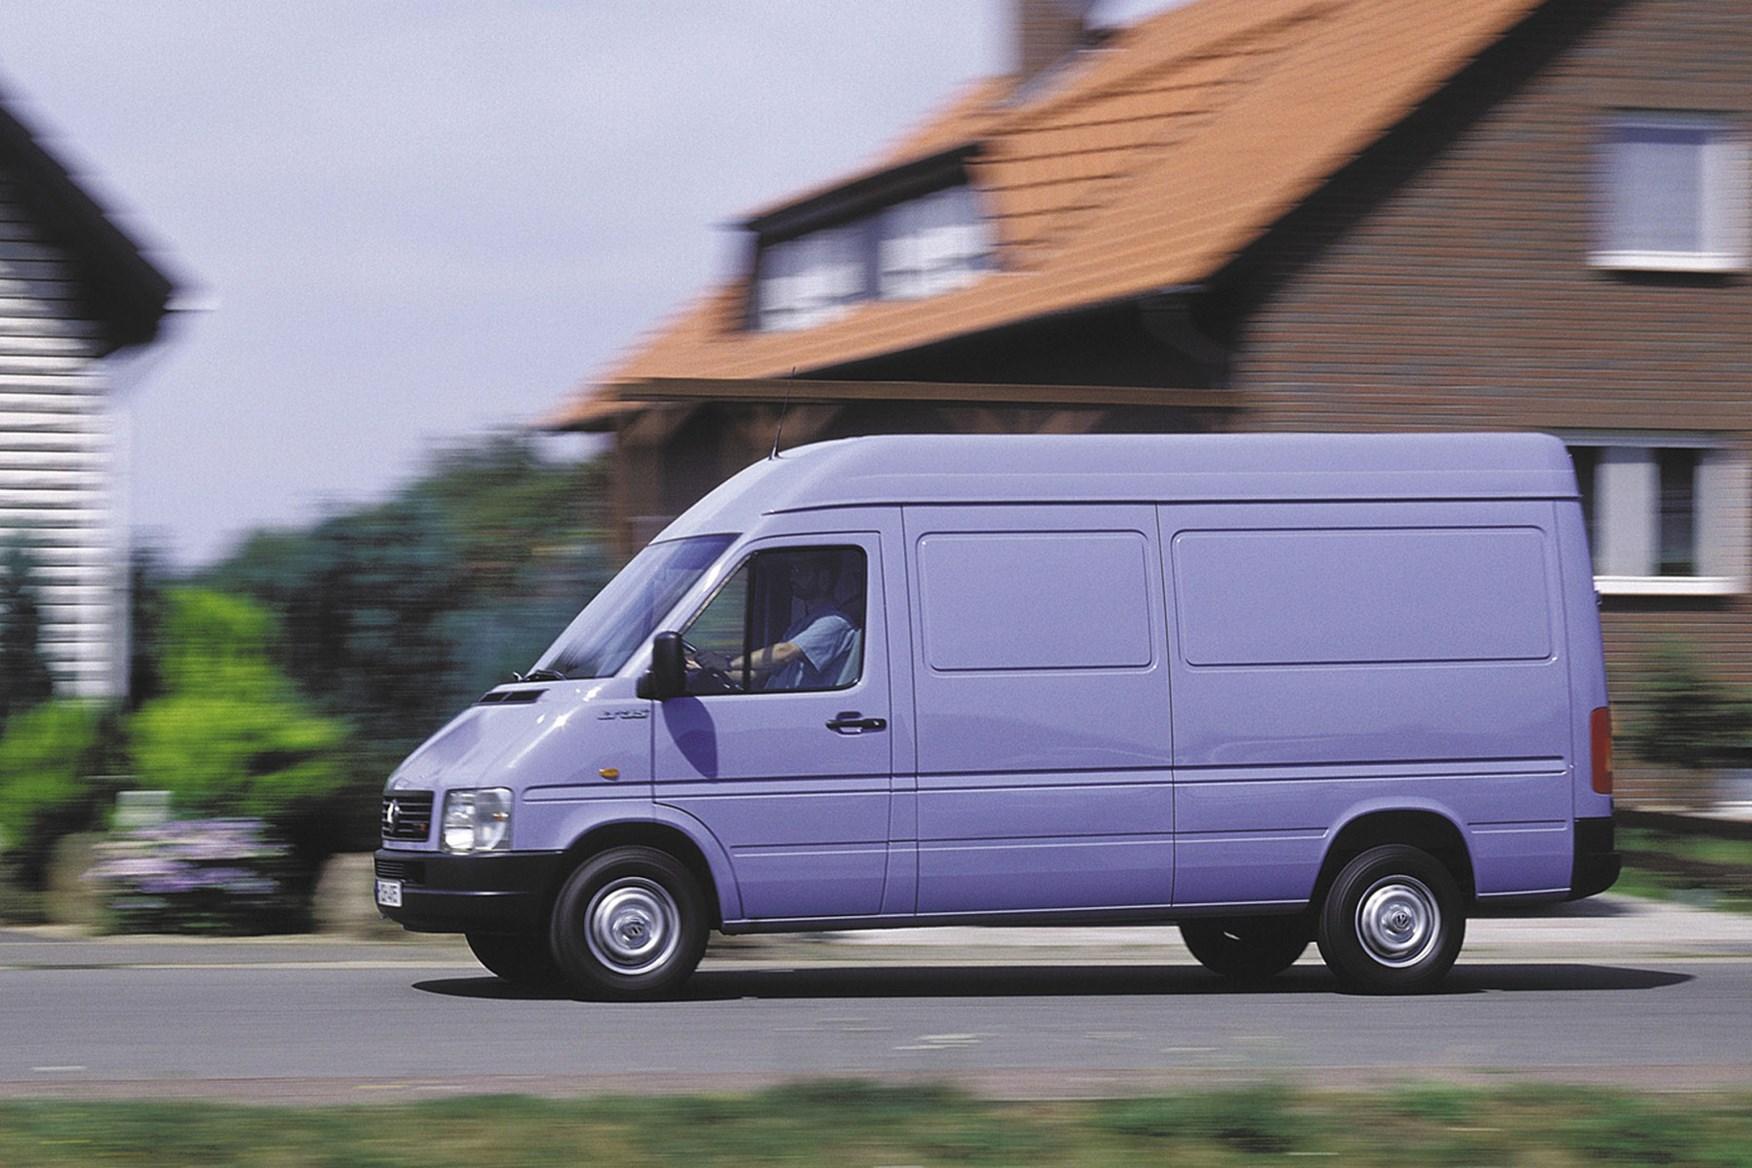 volkswagen lt van review 1996 2006 parkers. Black Bedroom Furniture Sets. Home Design Ideas